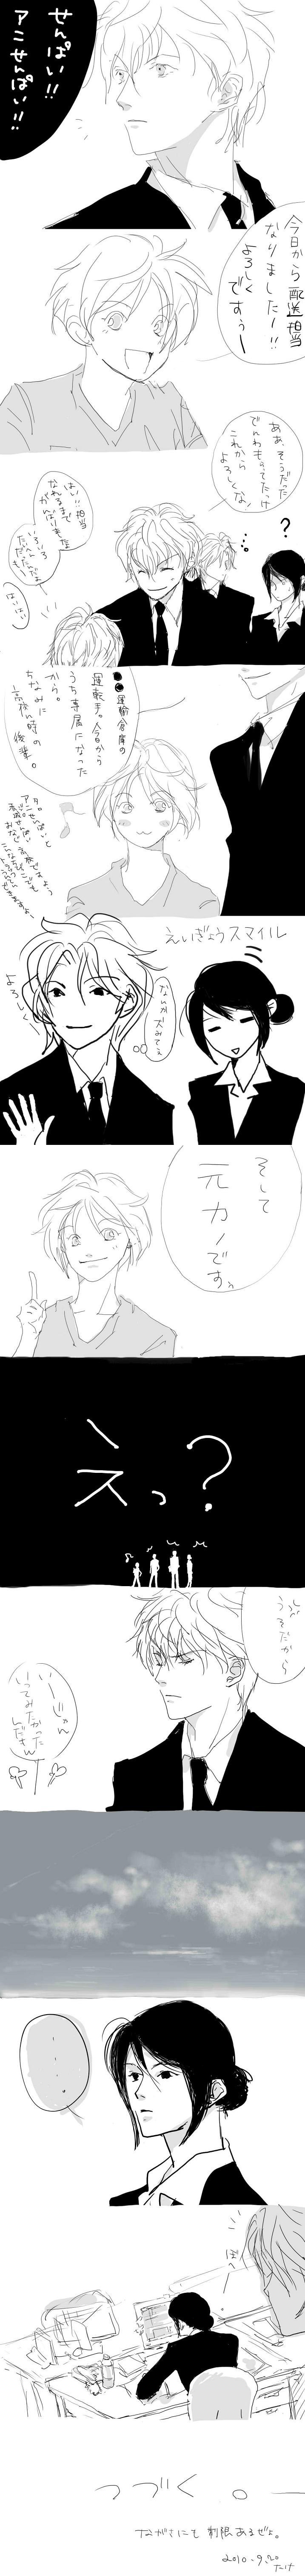 akagibumi1.jpg